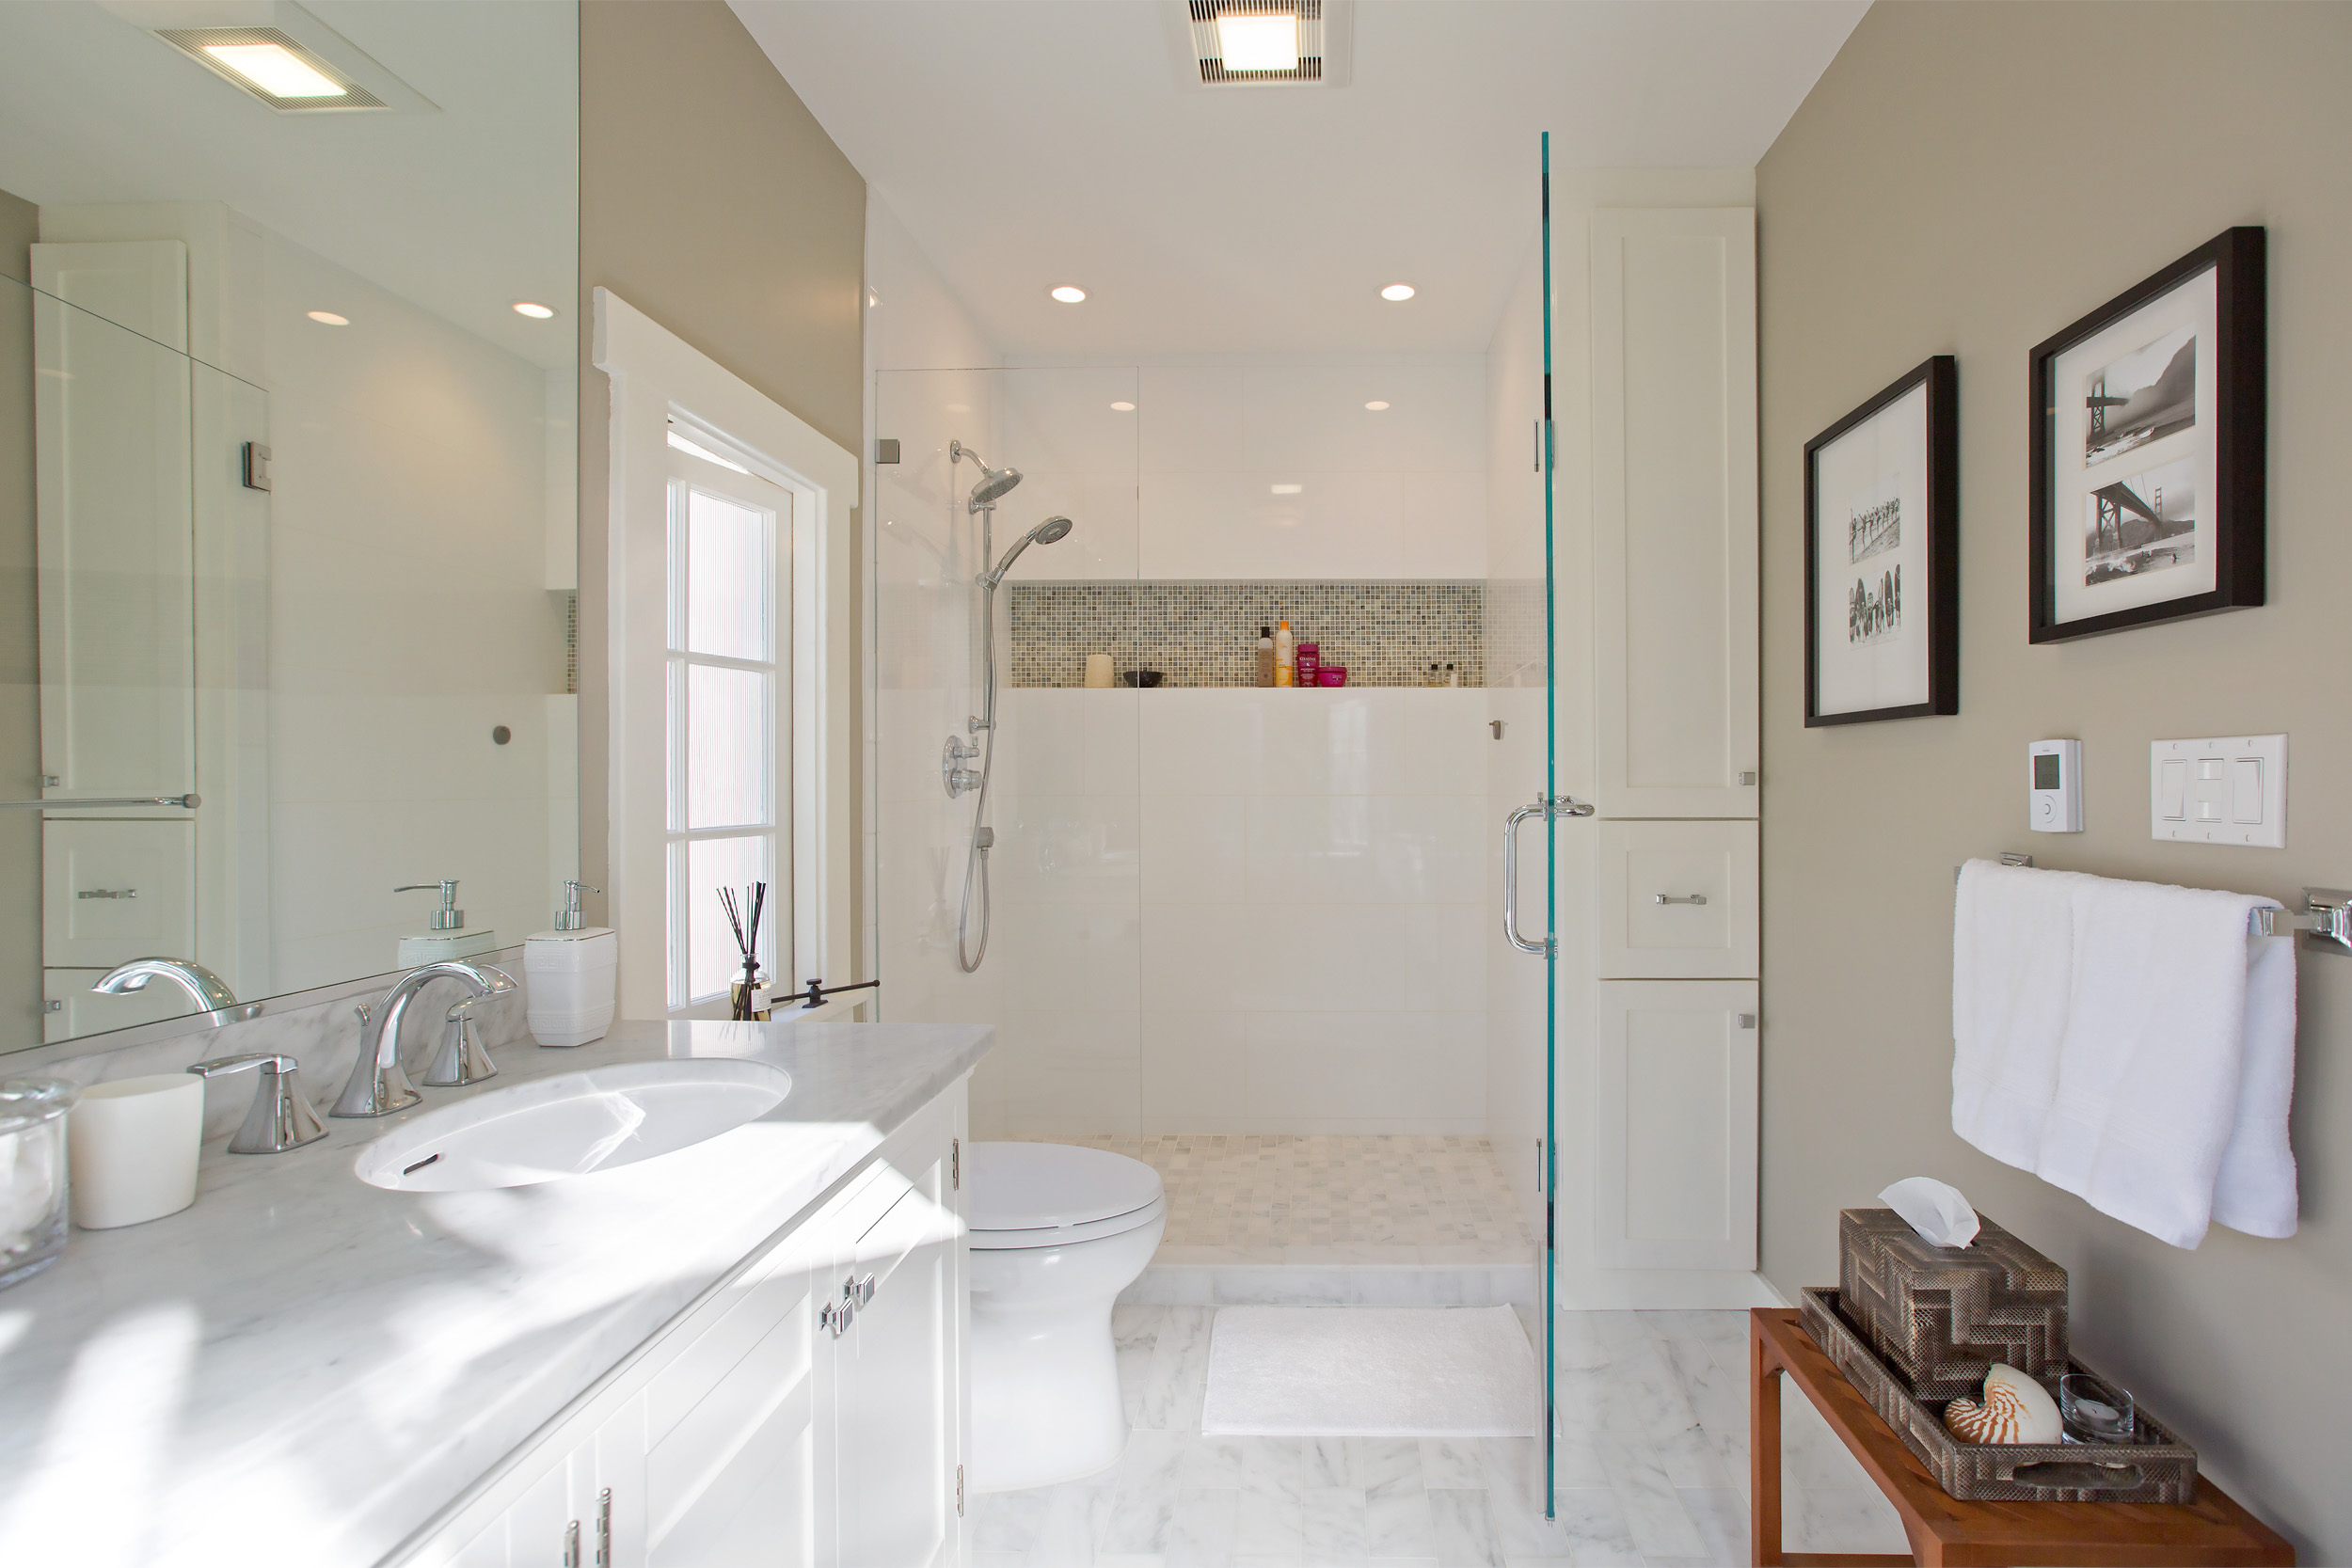 william-adams-design-cole-valley-white-bathroom-double-marble-vanity-walk-in-shower-2.jpg